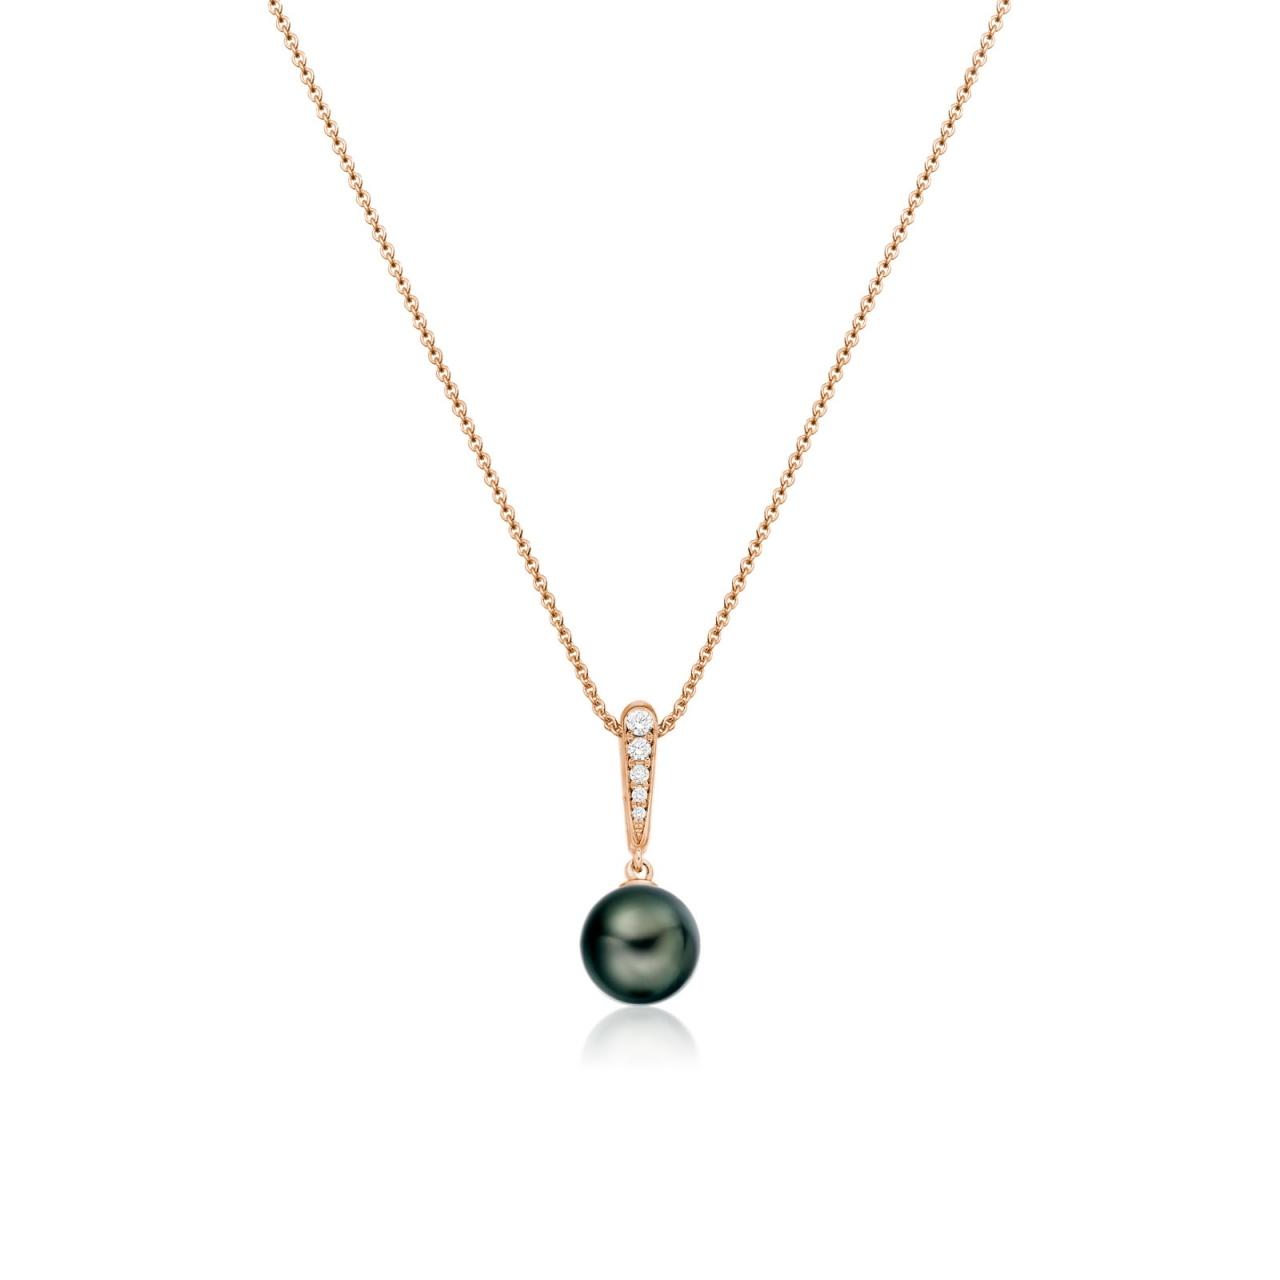 Mythologie Dark Dewdrop Tahitian Pearl Pendant in Rose Gold-TPVARRG1287-1